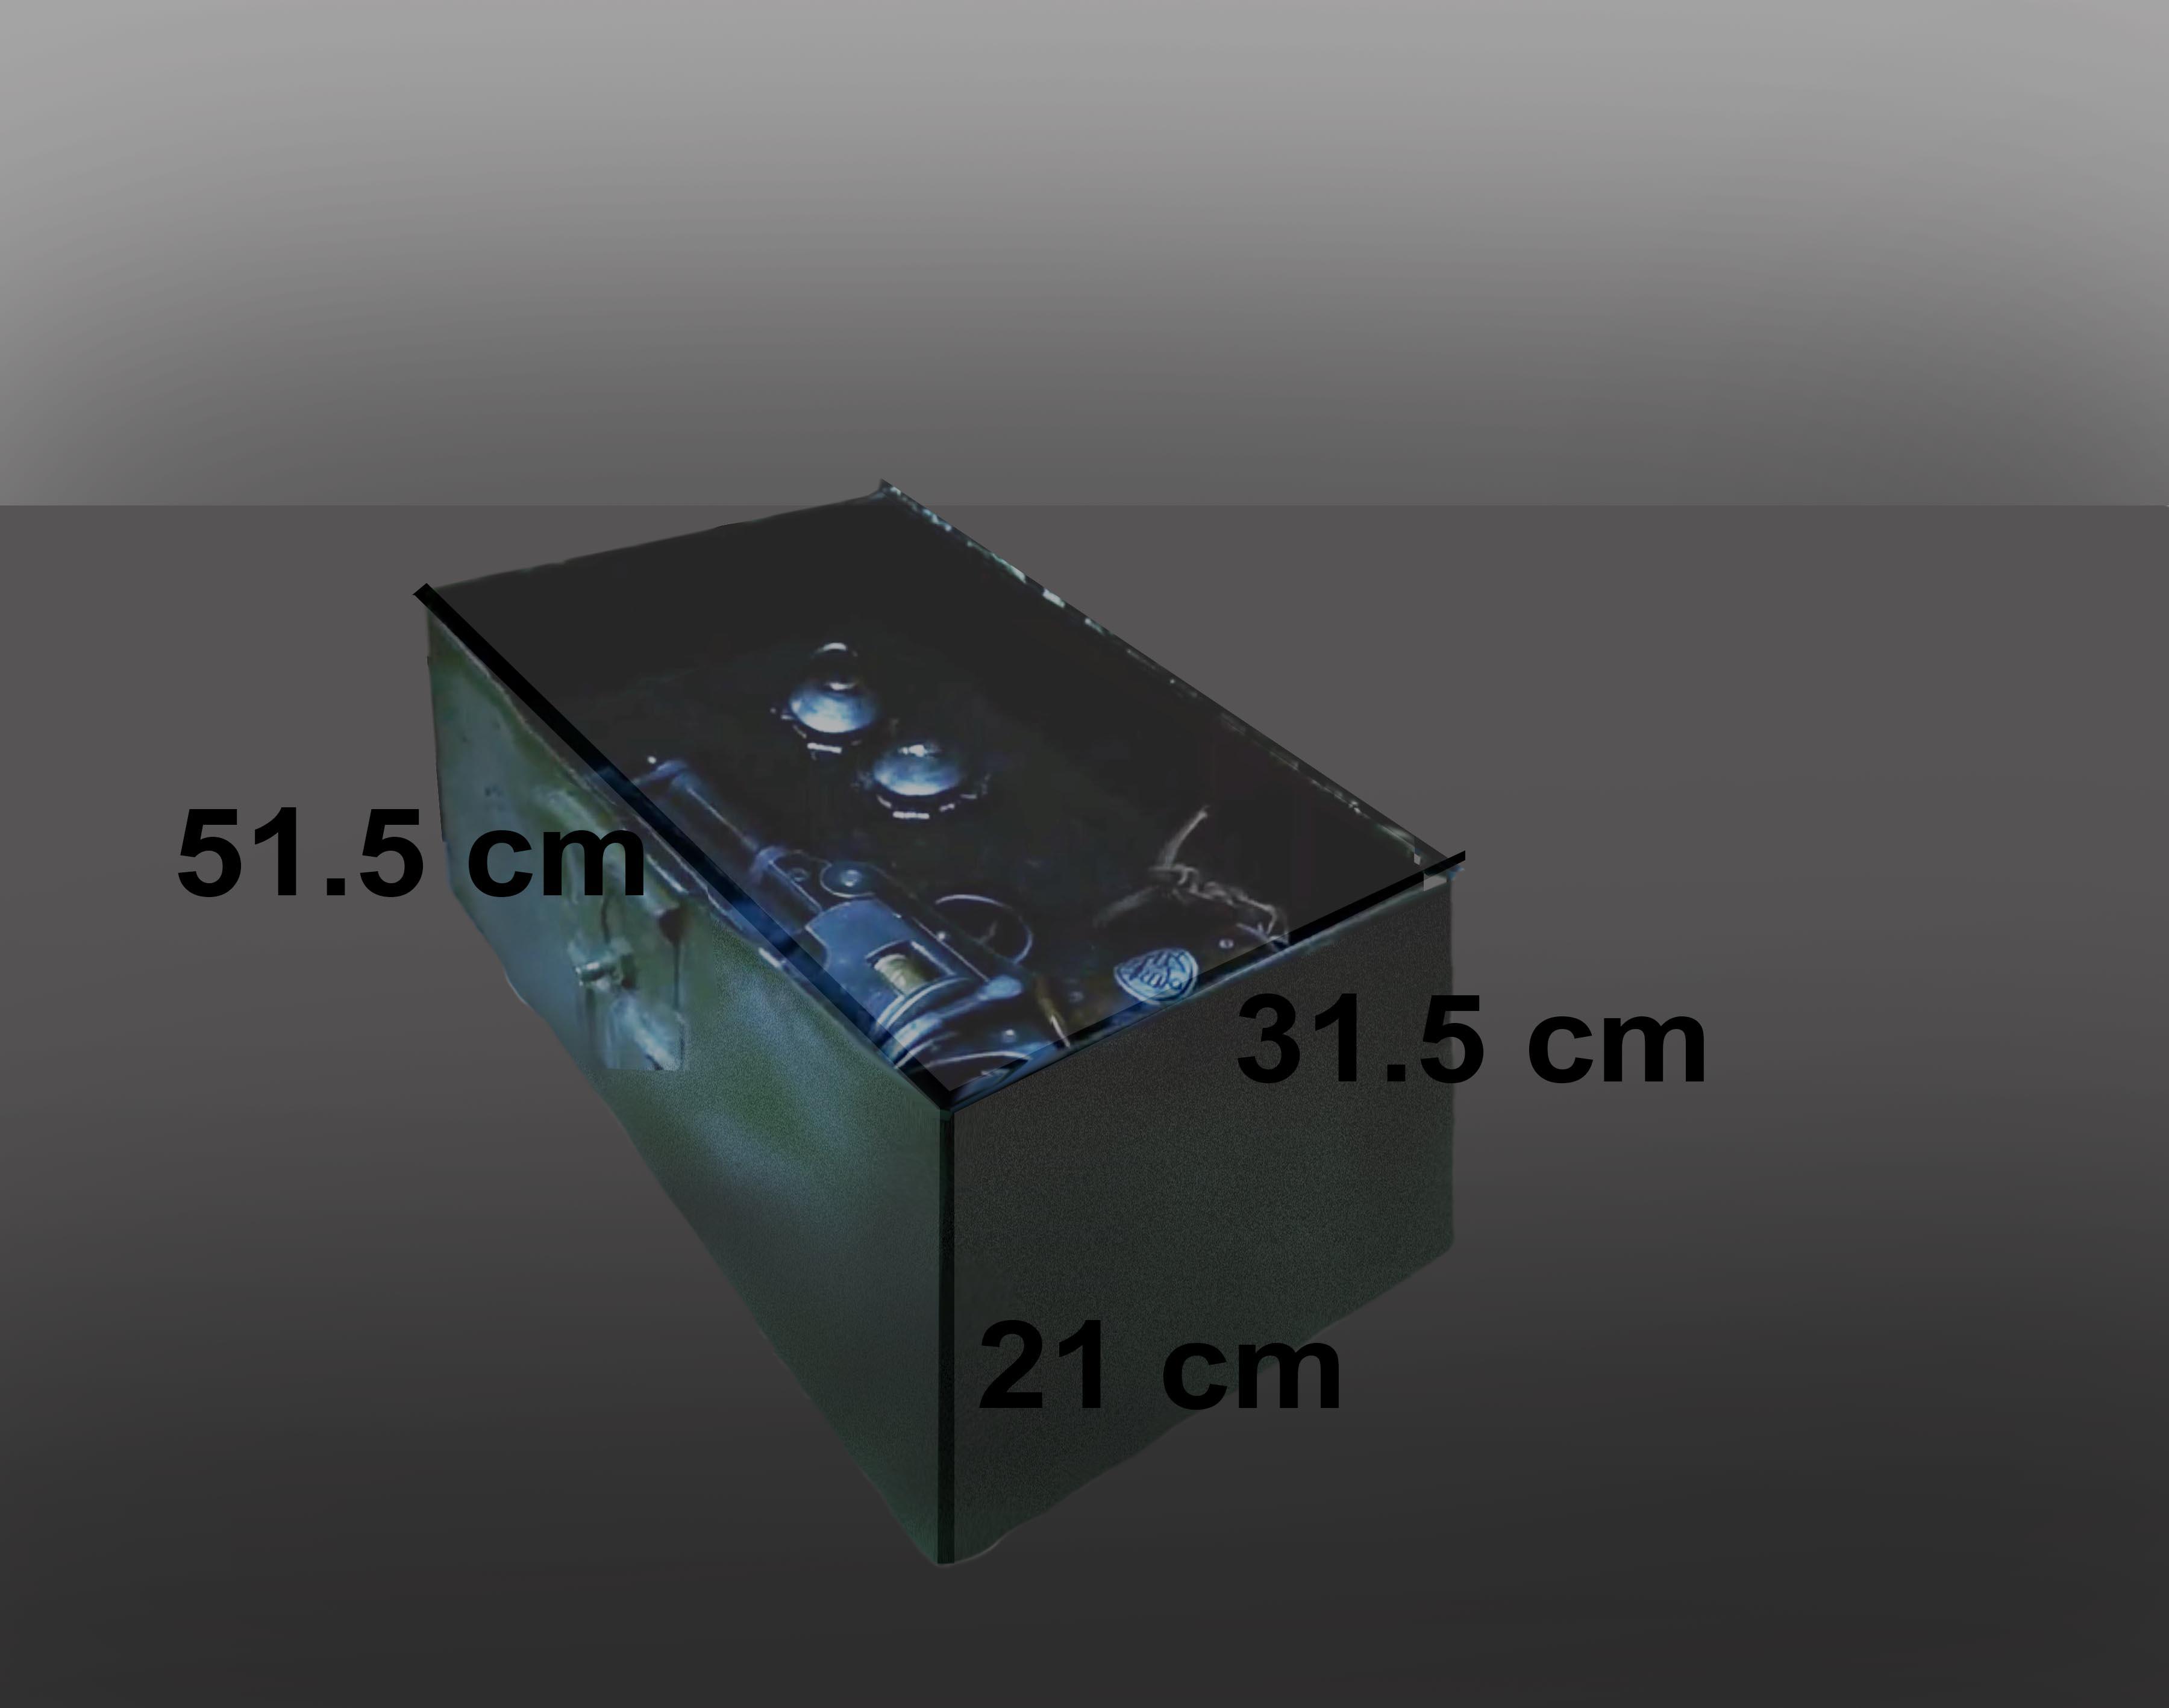 Hell-Boy-box numberspic.jpg